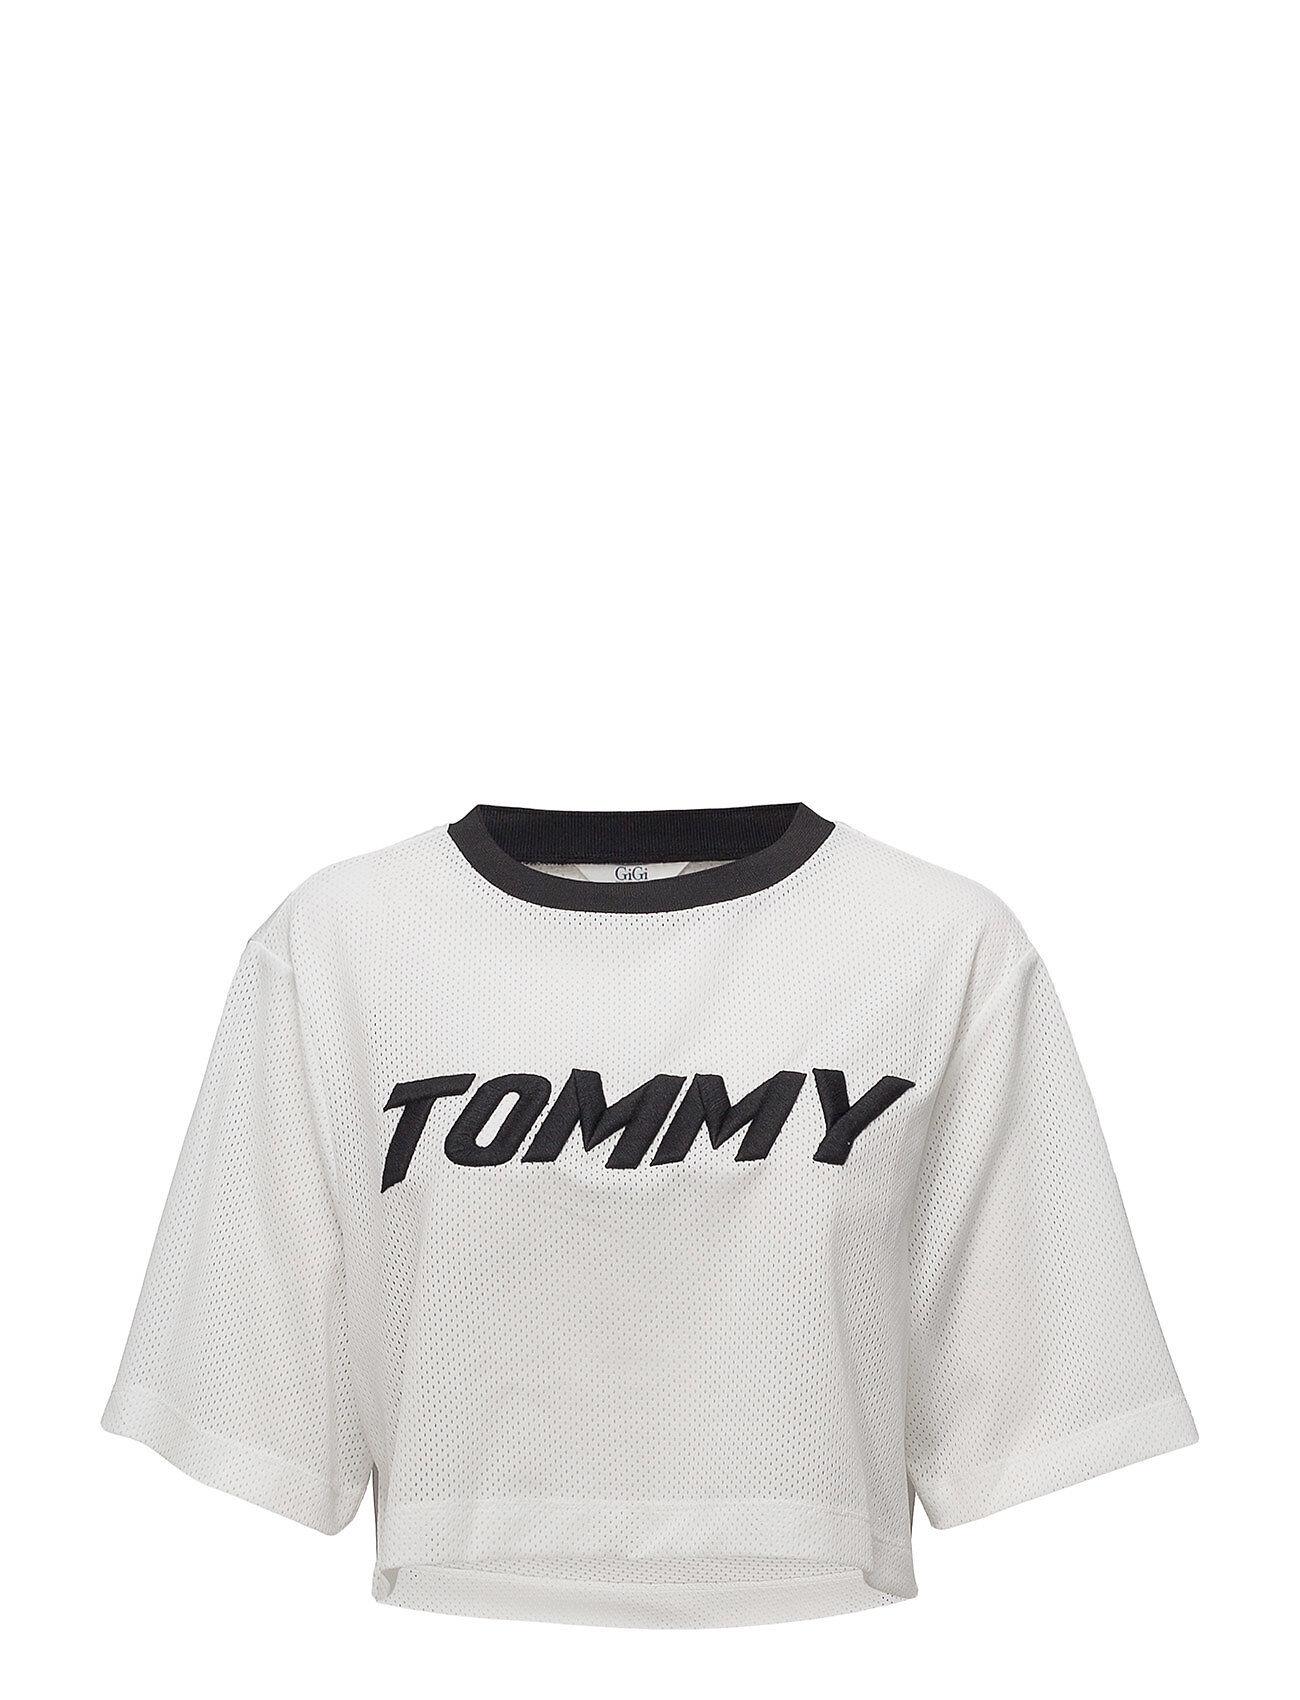 Tommy Hilfiger Gigi Hadid Racing Ss